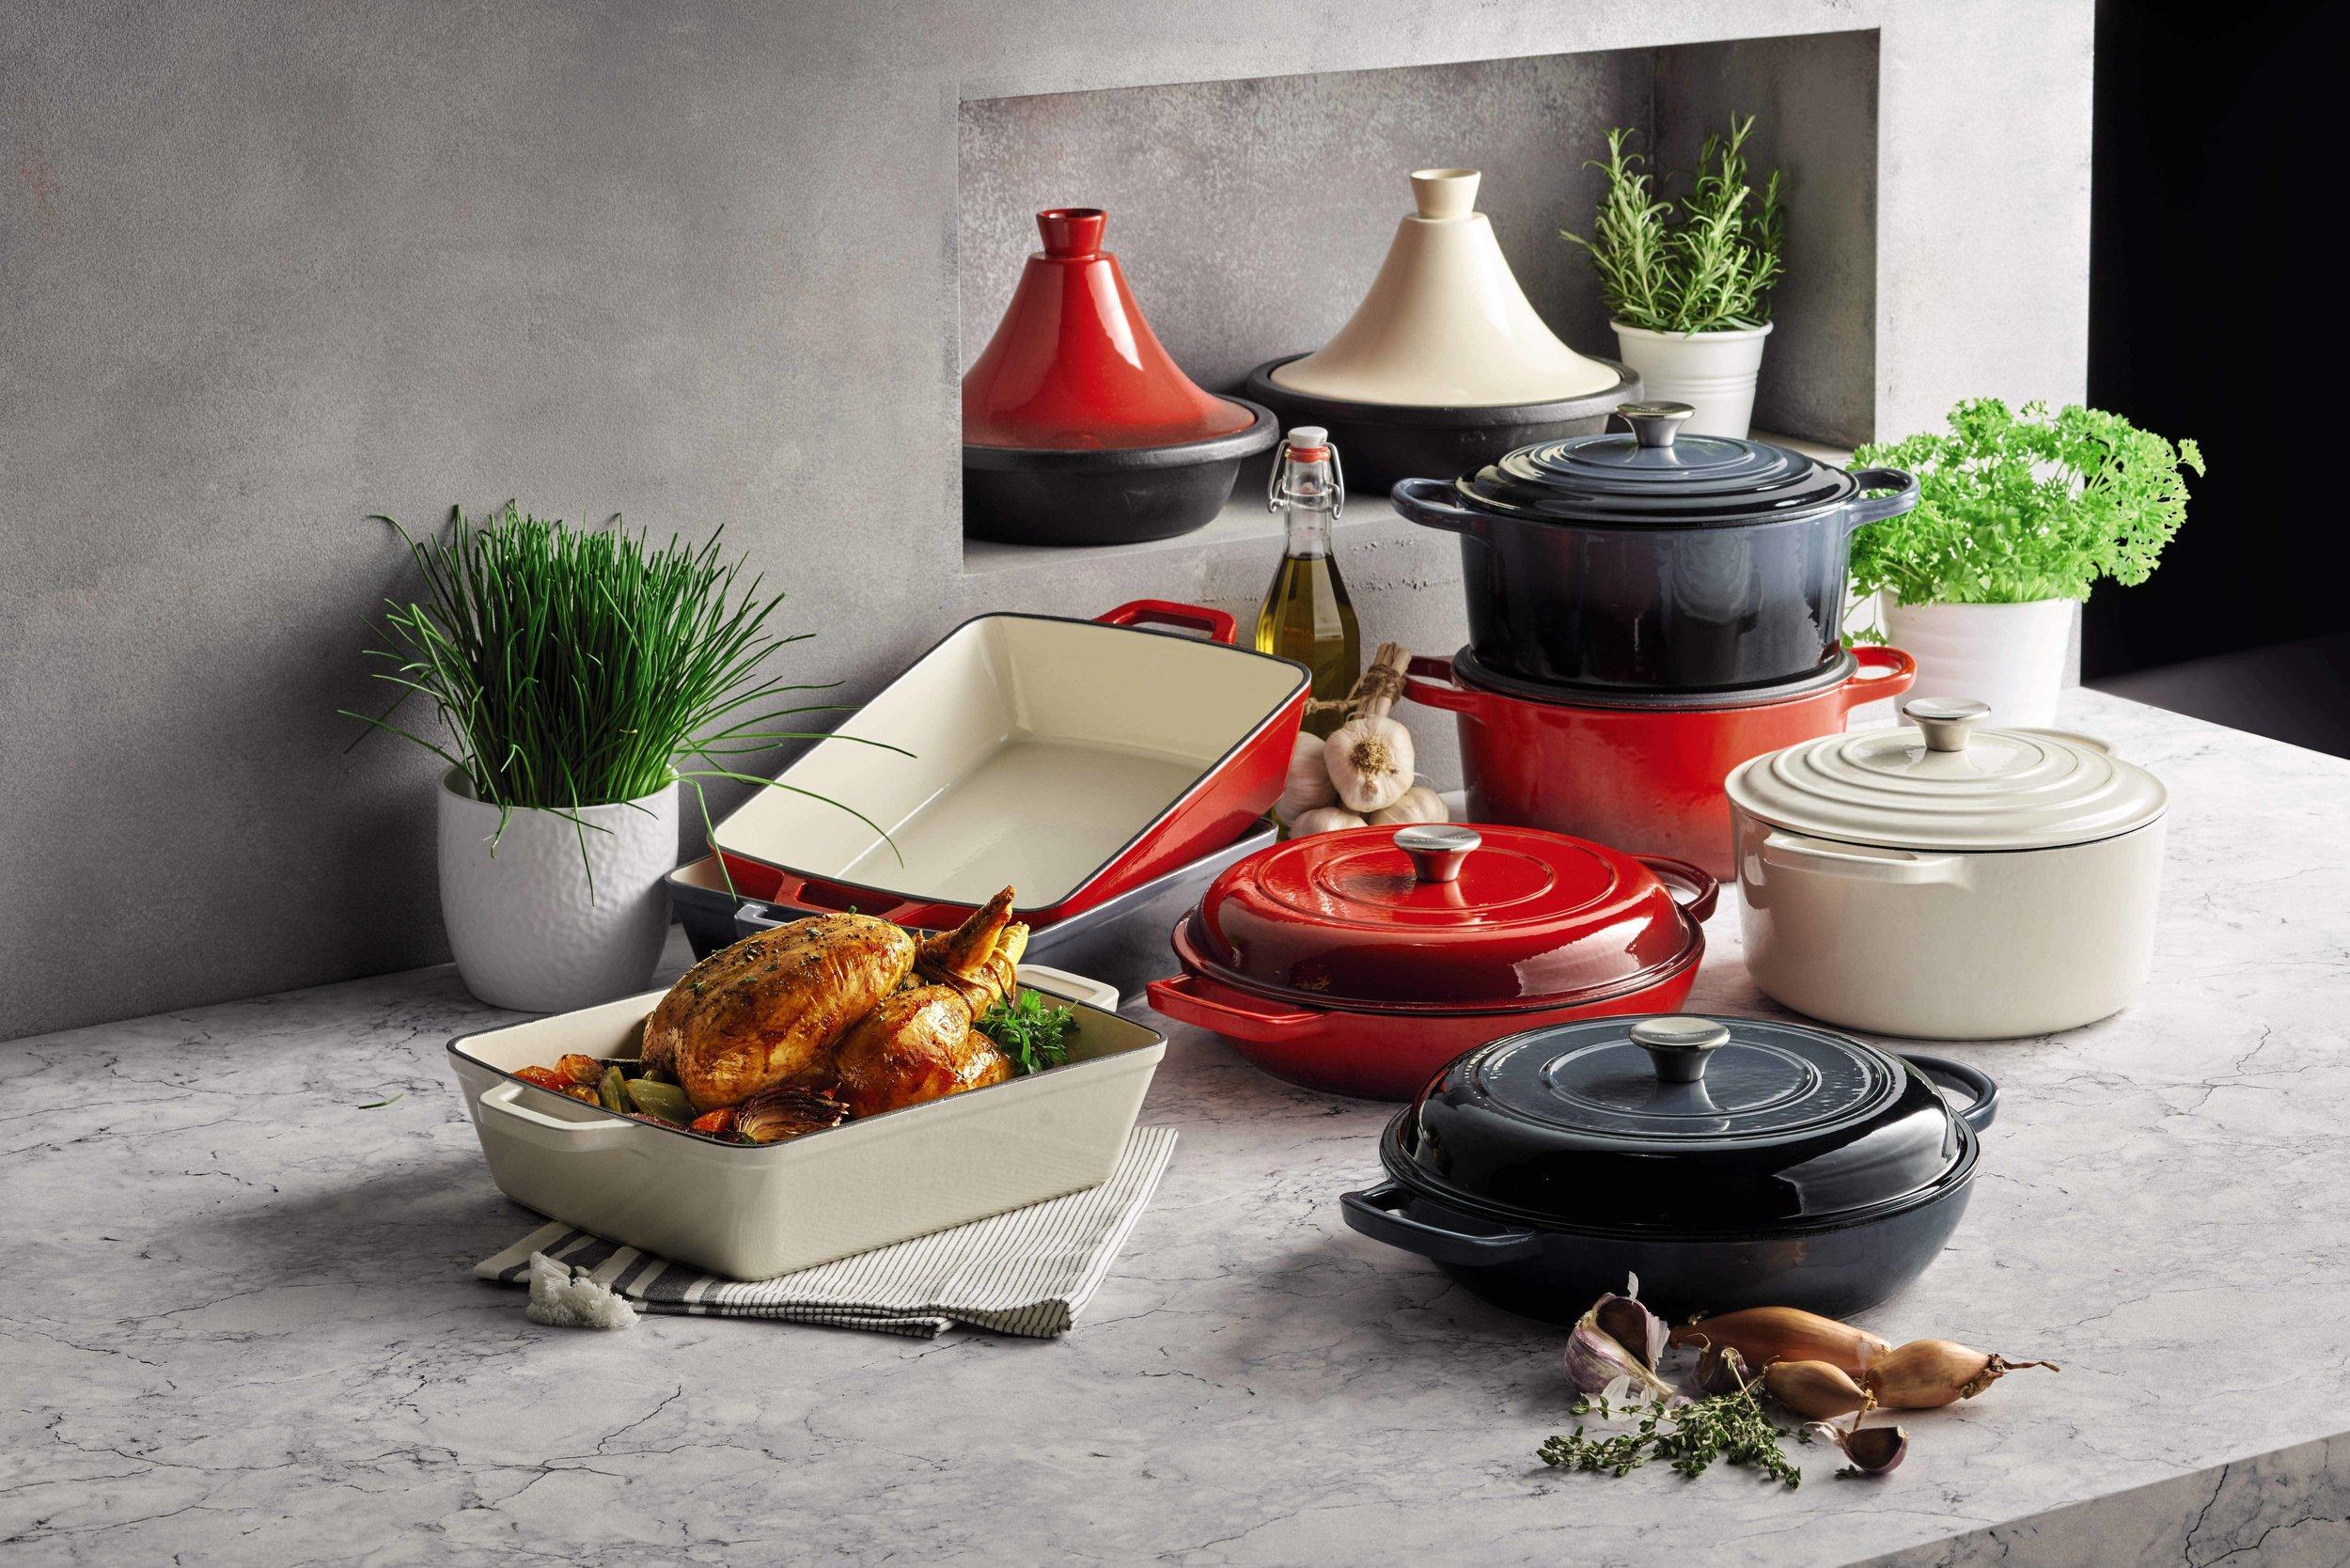 LIV for Interiors / Aldi Cast Iron Cookware Range